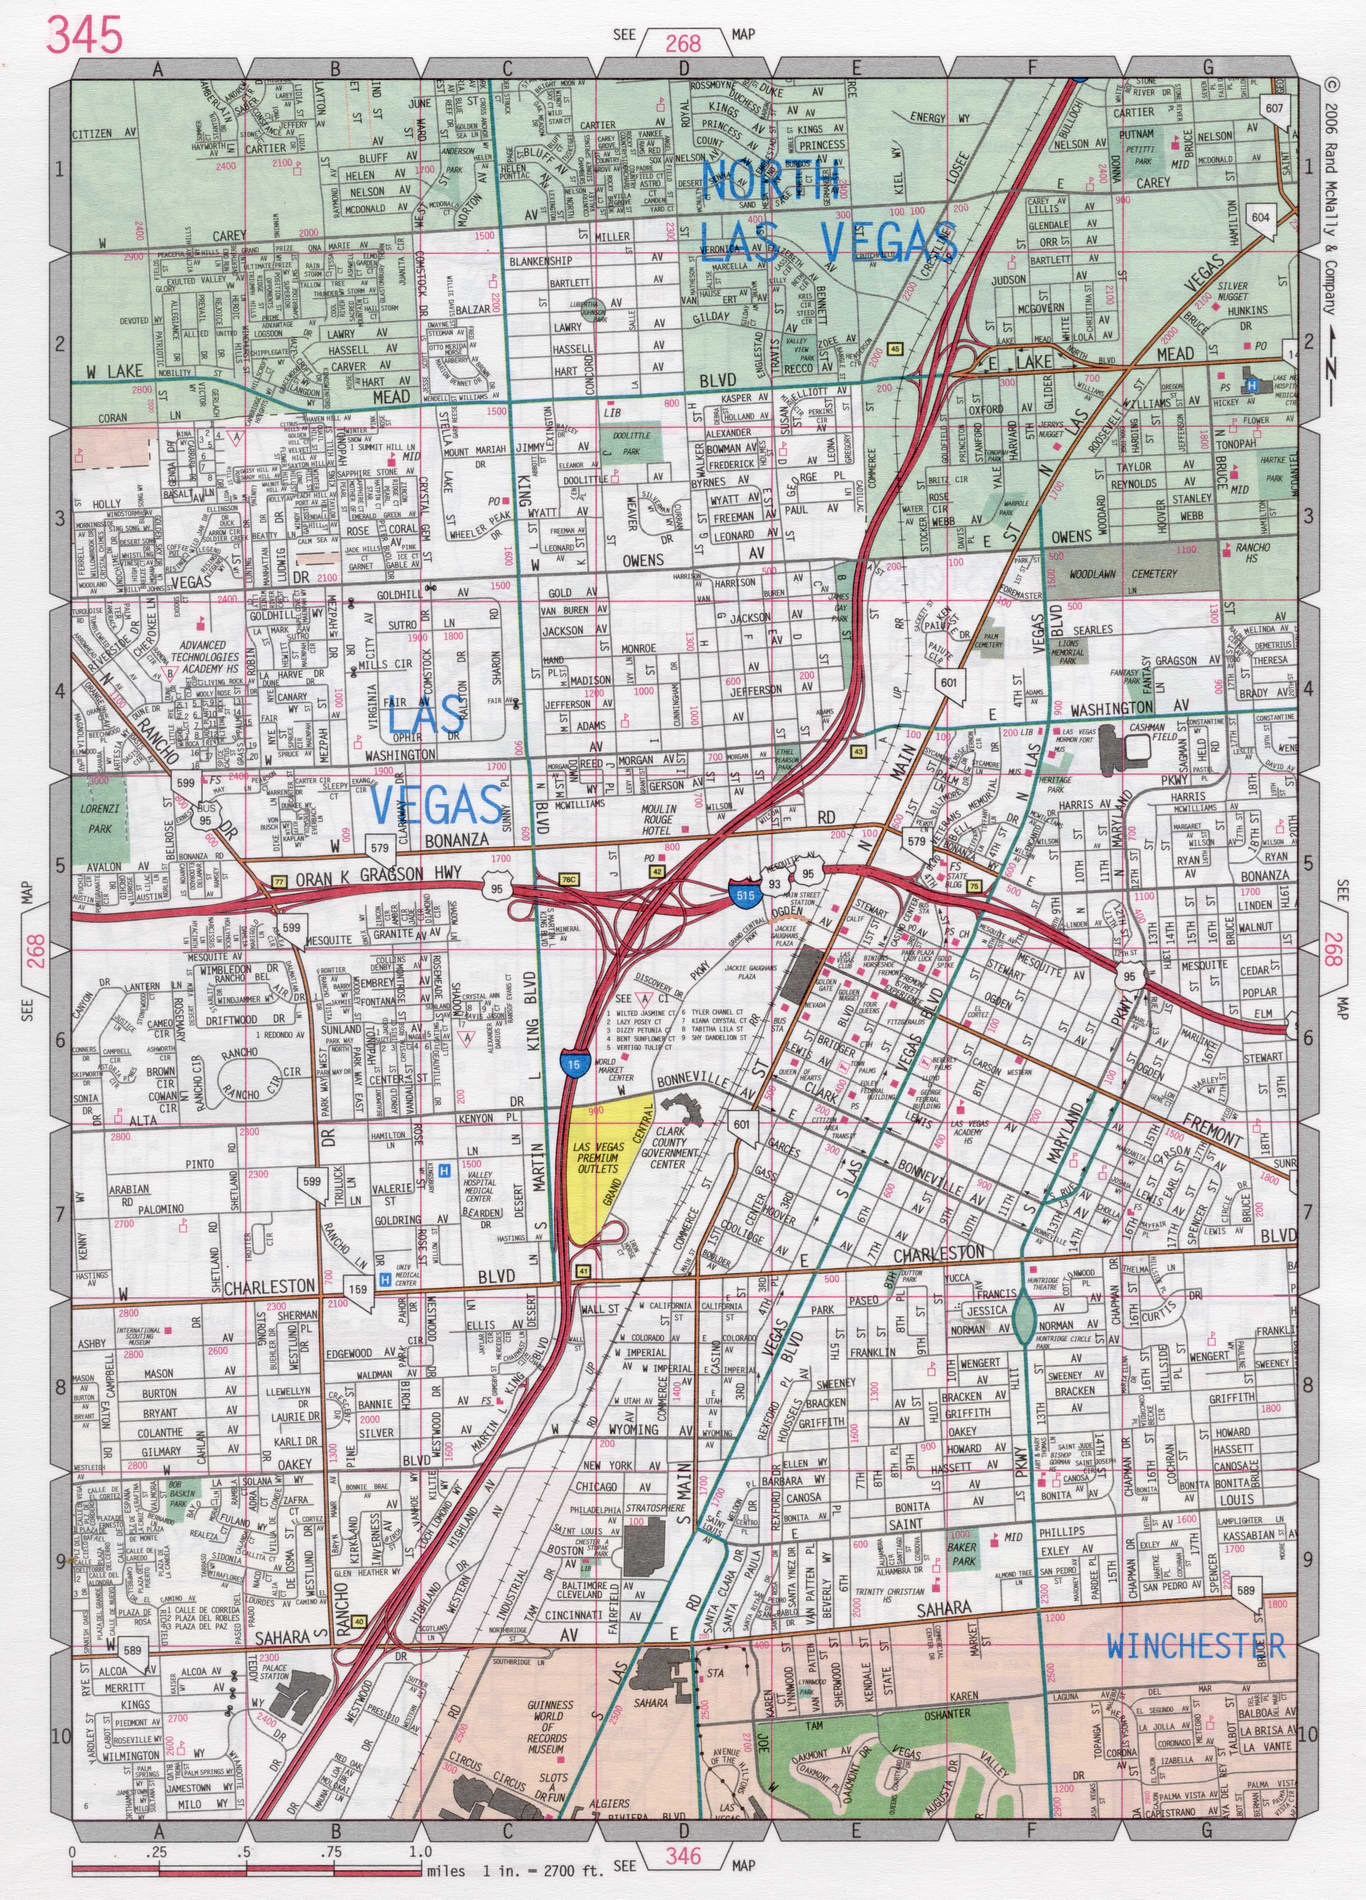 Las Vegas Road Map - Las vegas street map